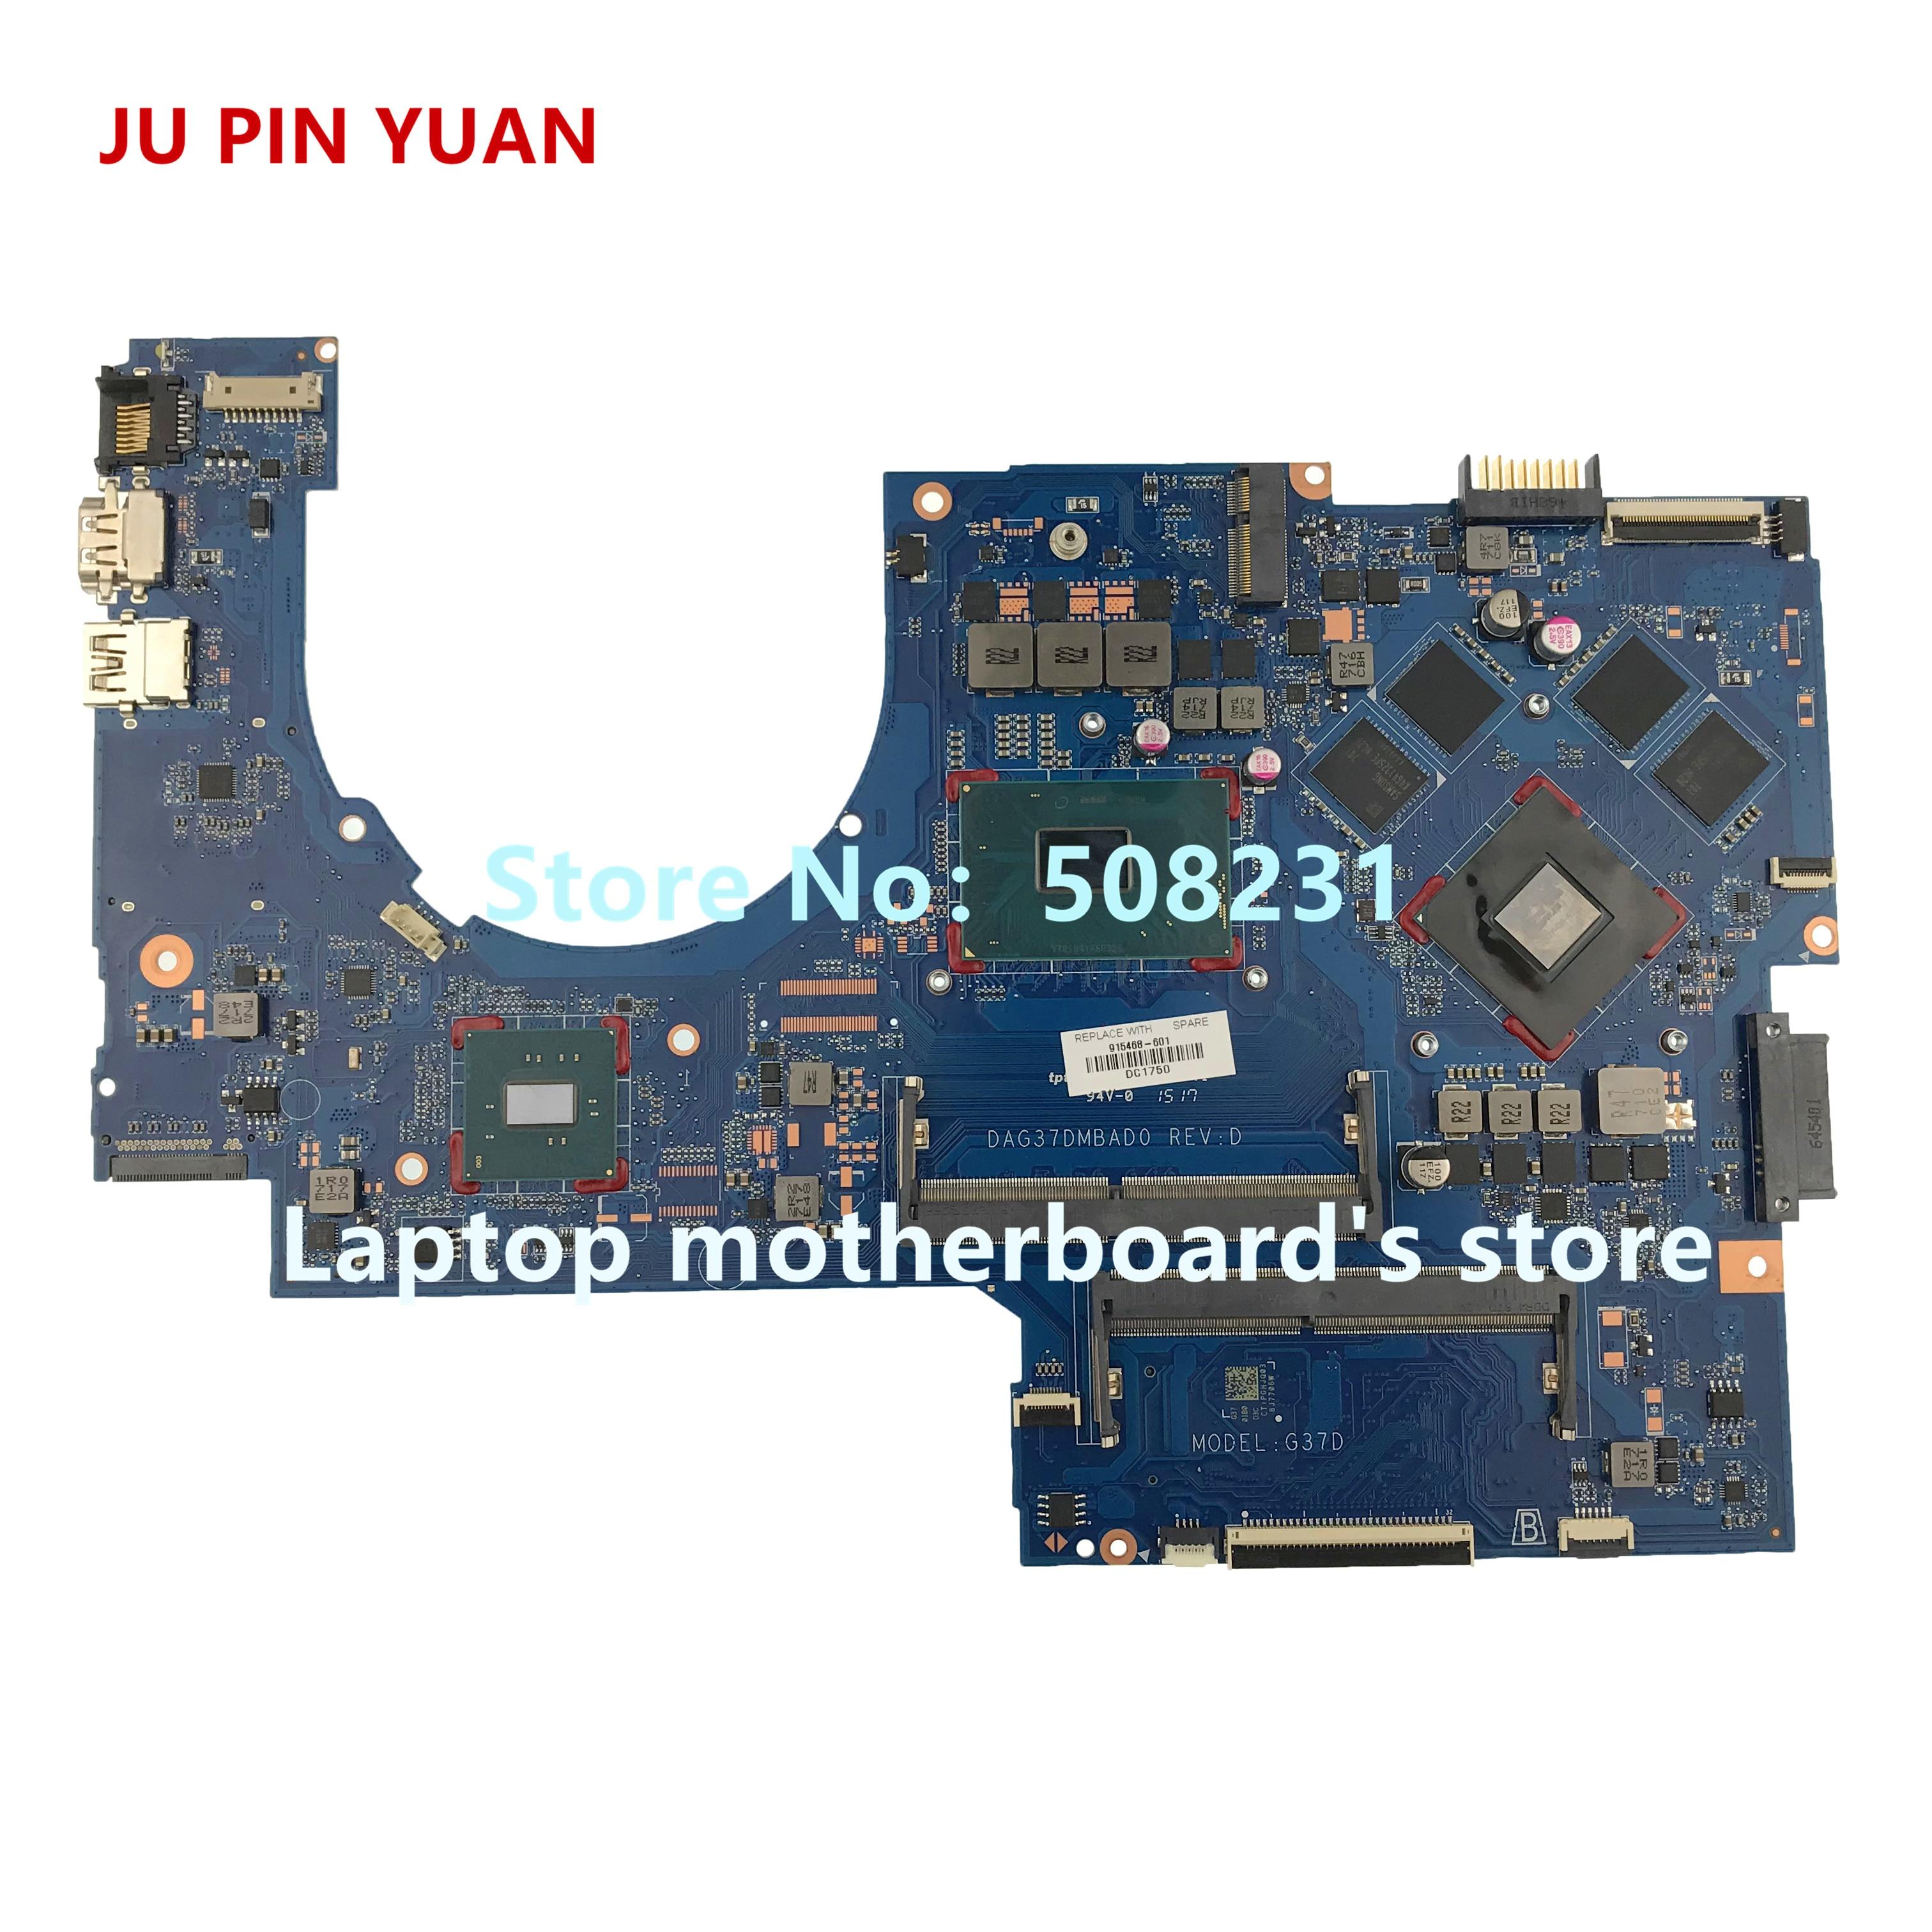 JU PIN YUAN 915468-601 915468-001 DAG37DMBAD0 Laptop motherboard Para PRESSÁGIO por HP Laptop 17-W 17- AB Notebook PC 1050 gb i5-7300 2